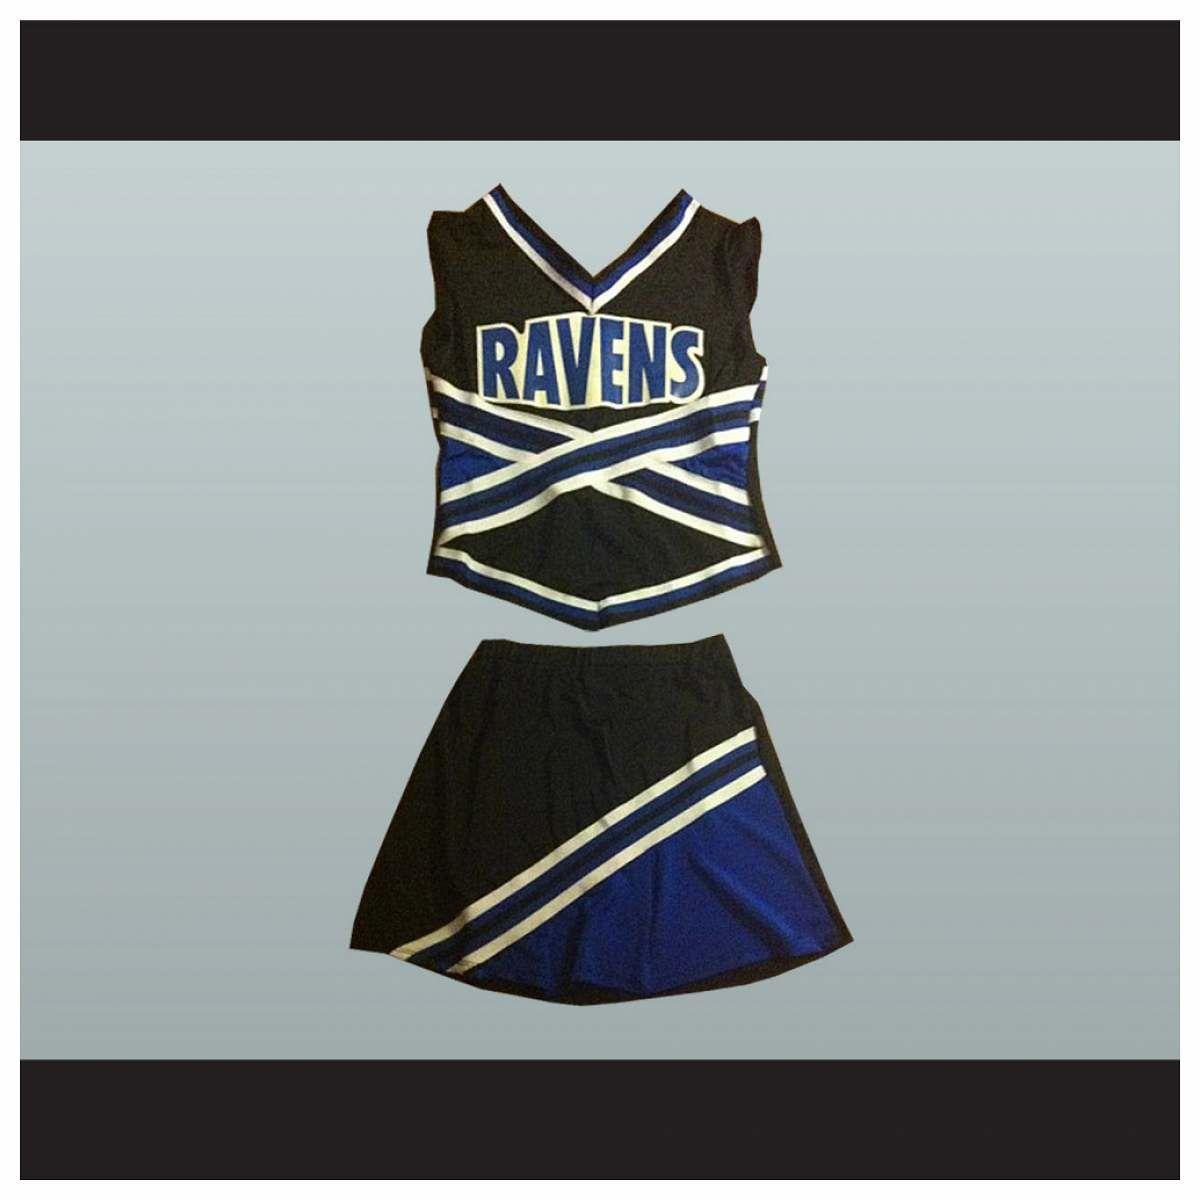 80 one tree hill ravens cheerleader uniform stitch sewn halloween 80 one tree hill ravens cheerleader uniform stitch sewn publicscrutiny Choice Image